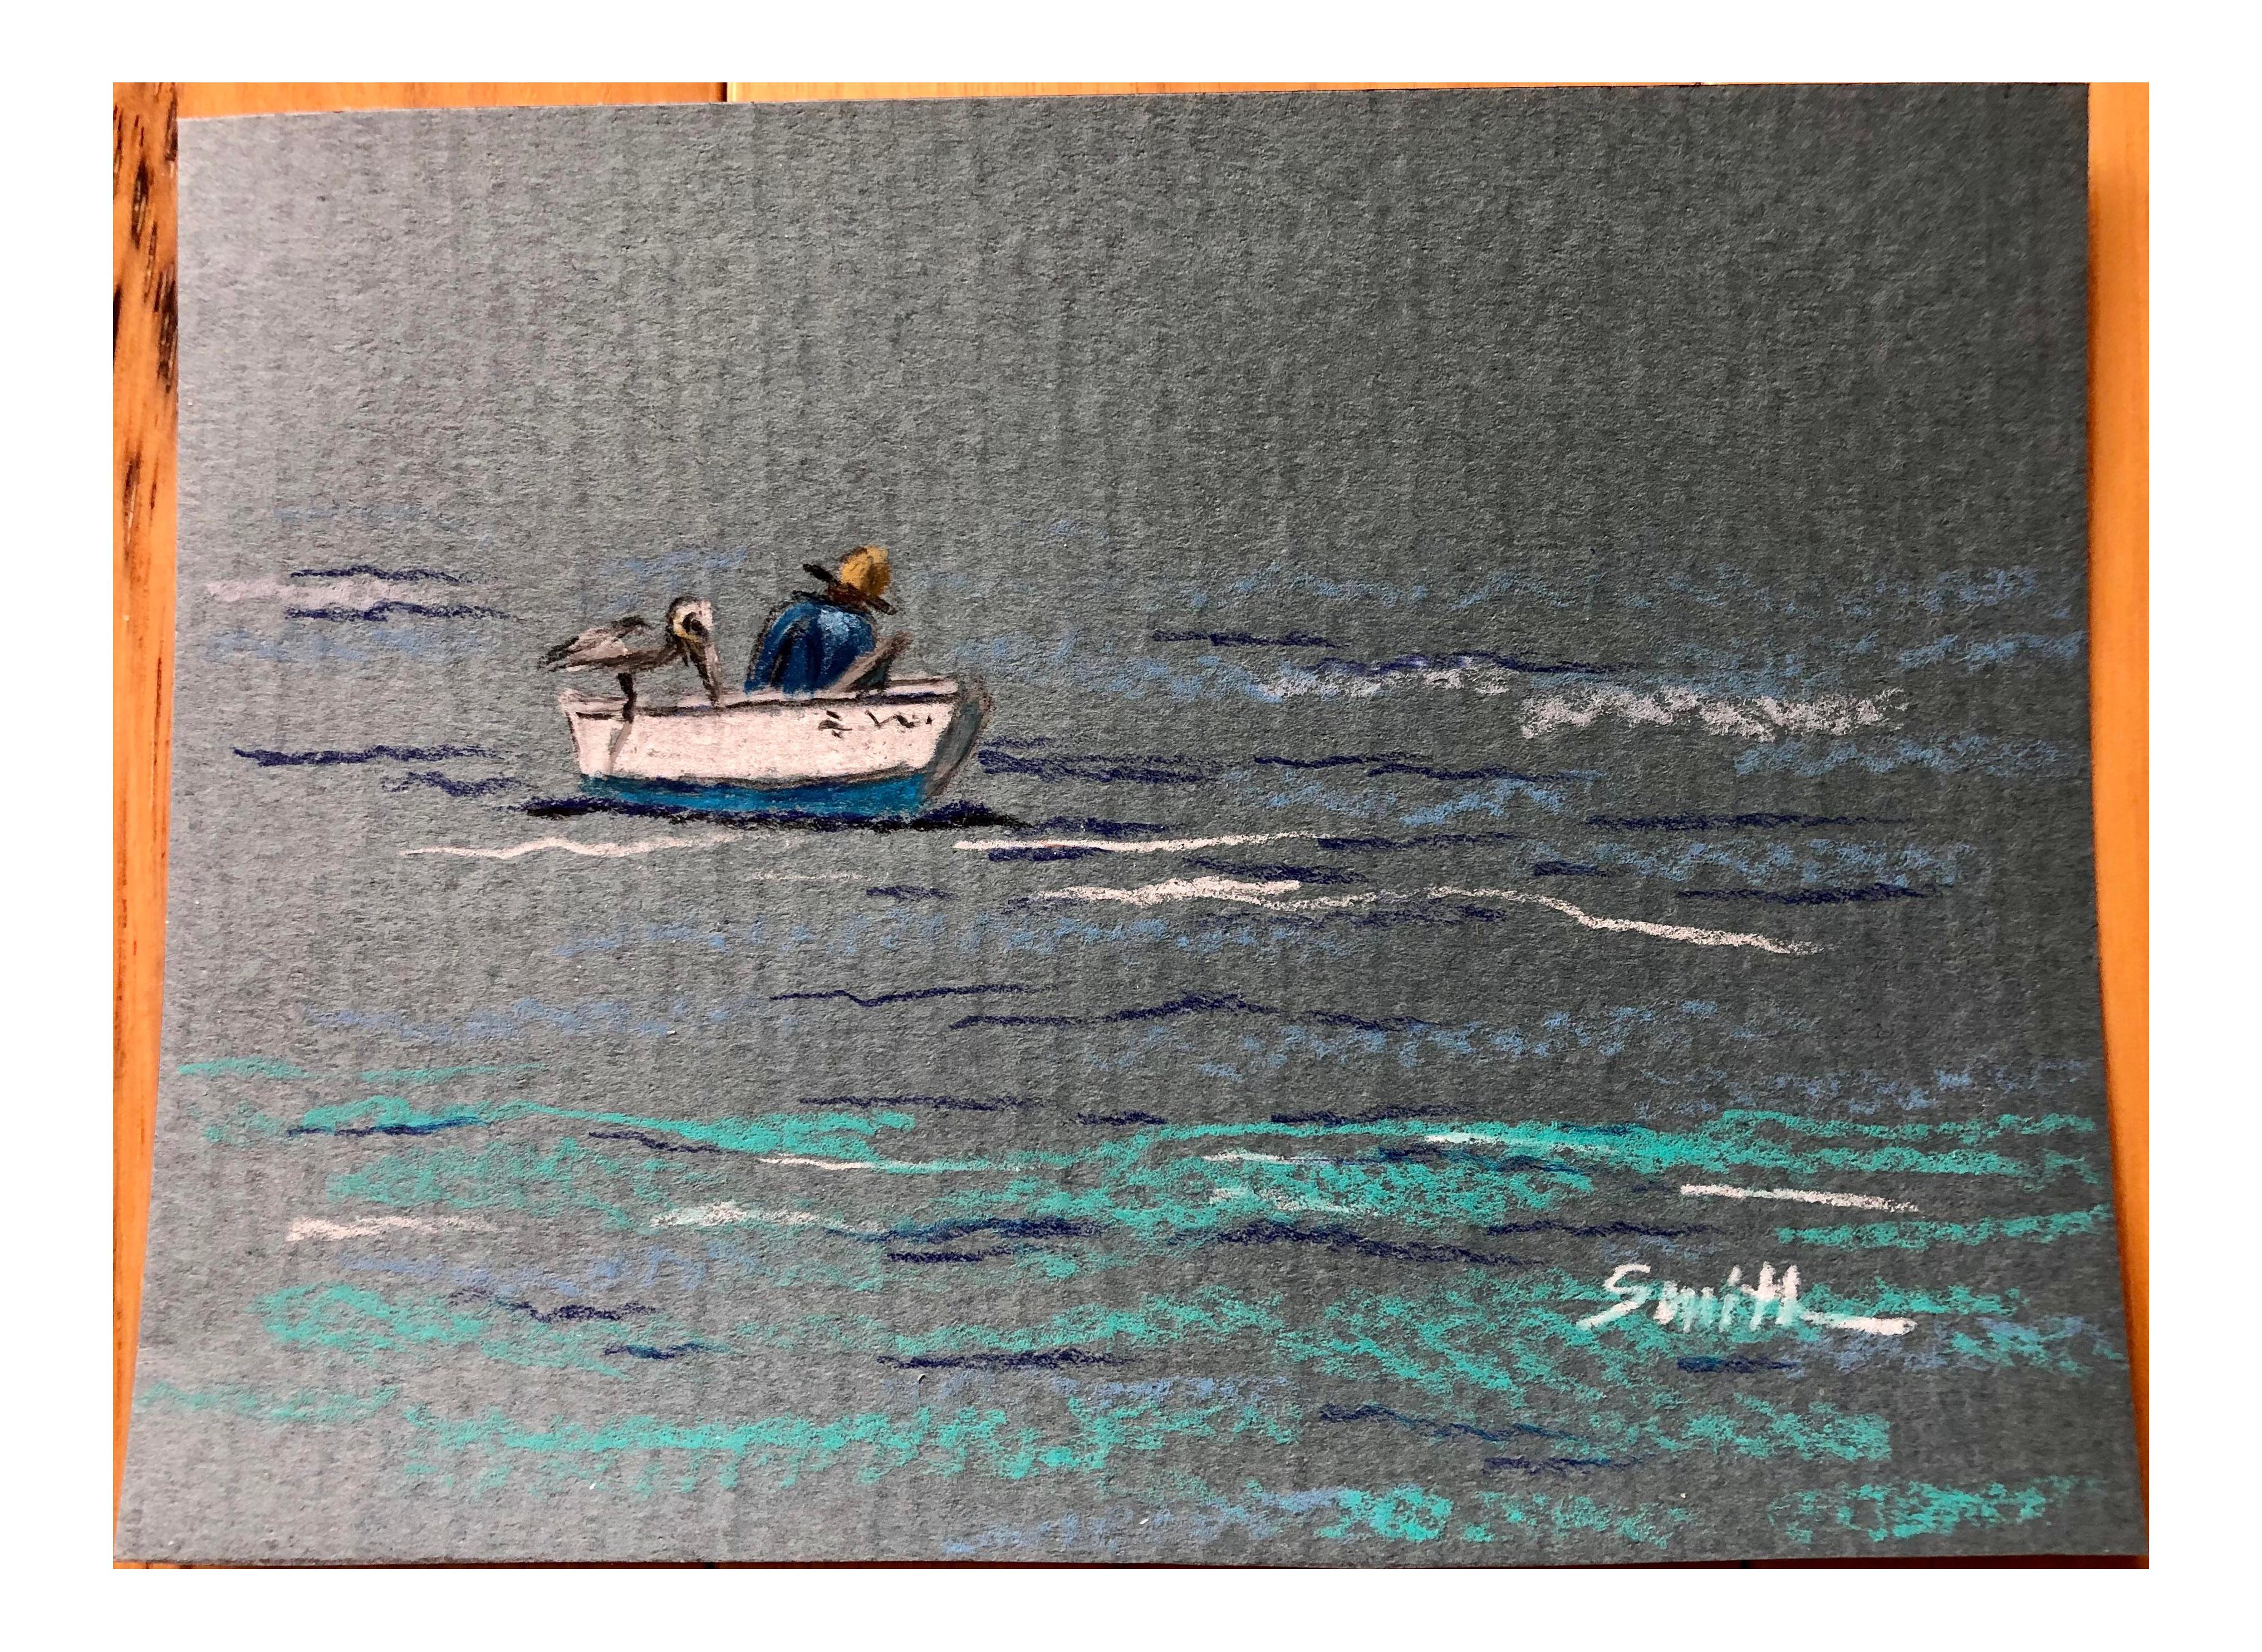 The Fisherman Colored Pencil Drawing On Chairish Com Tropical Fisherman Ocean Boat Fishing Pelican Blue Drawings Colored Pencil Drawing Pencil Drawings